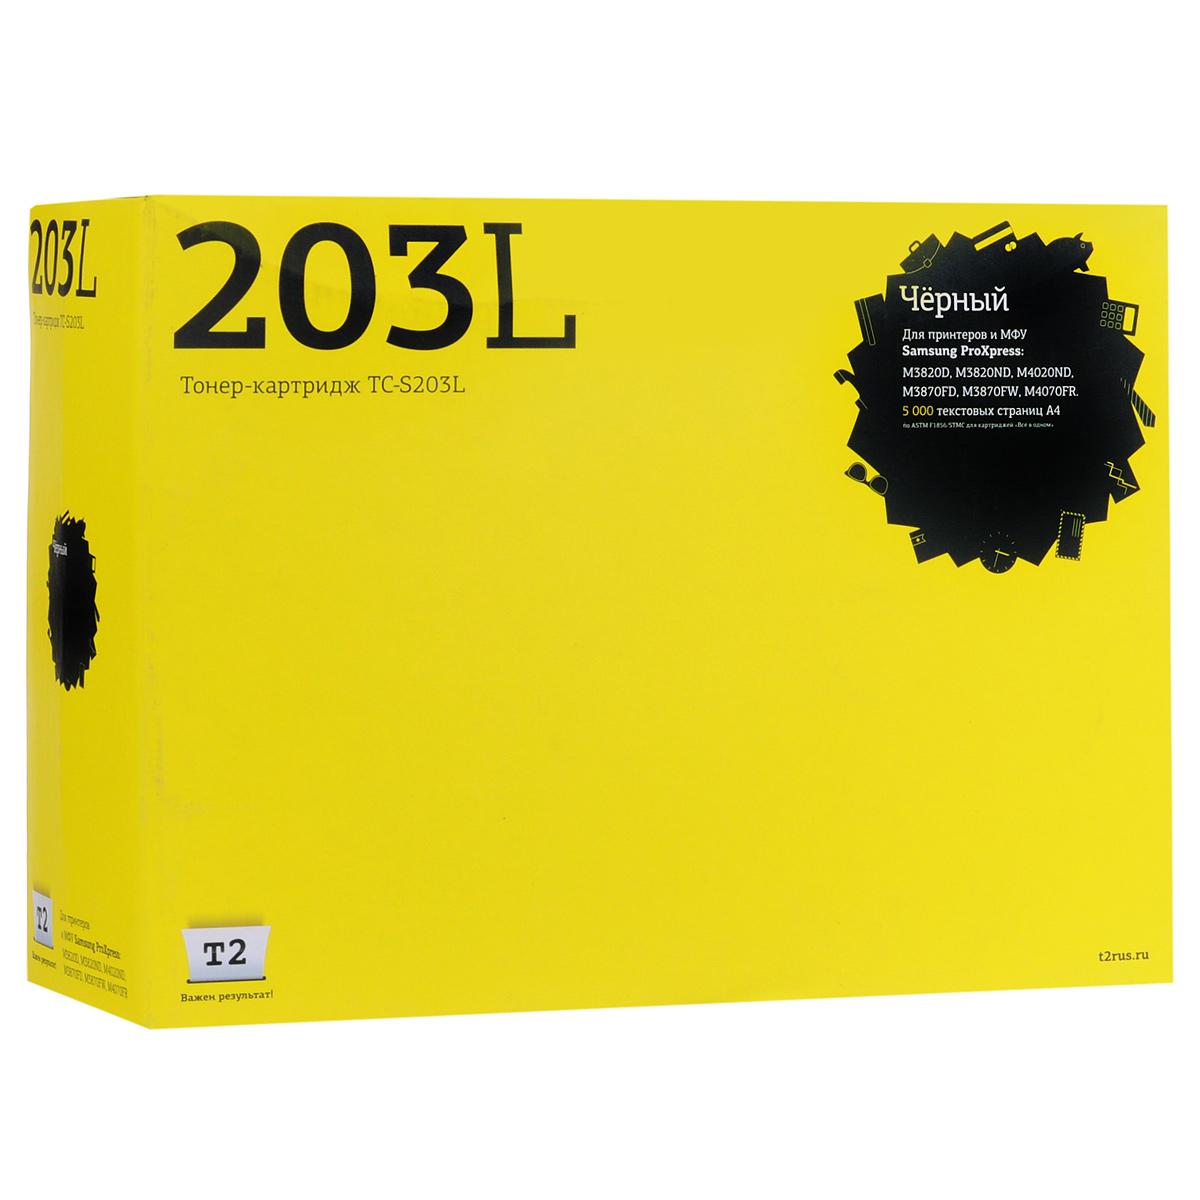 T2 TC-S203L картридж (аналог MLT-D203L) для Samsung ProXpress M3820D/M4020ND/M3870FD/M4070FR shoot tc 60e3 1 0 lcd camera timer remote cord for canon pentax samsung 1 x cr2032